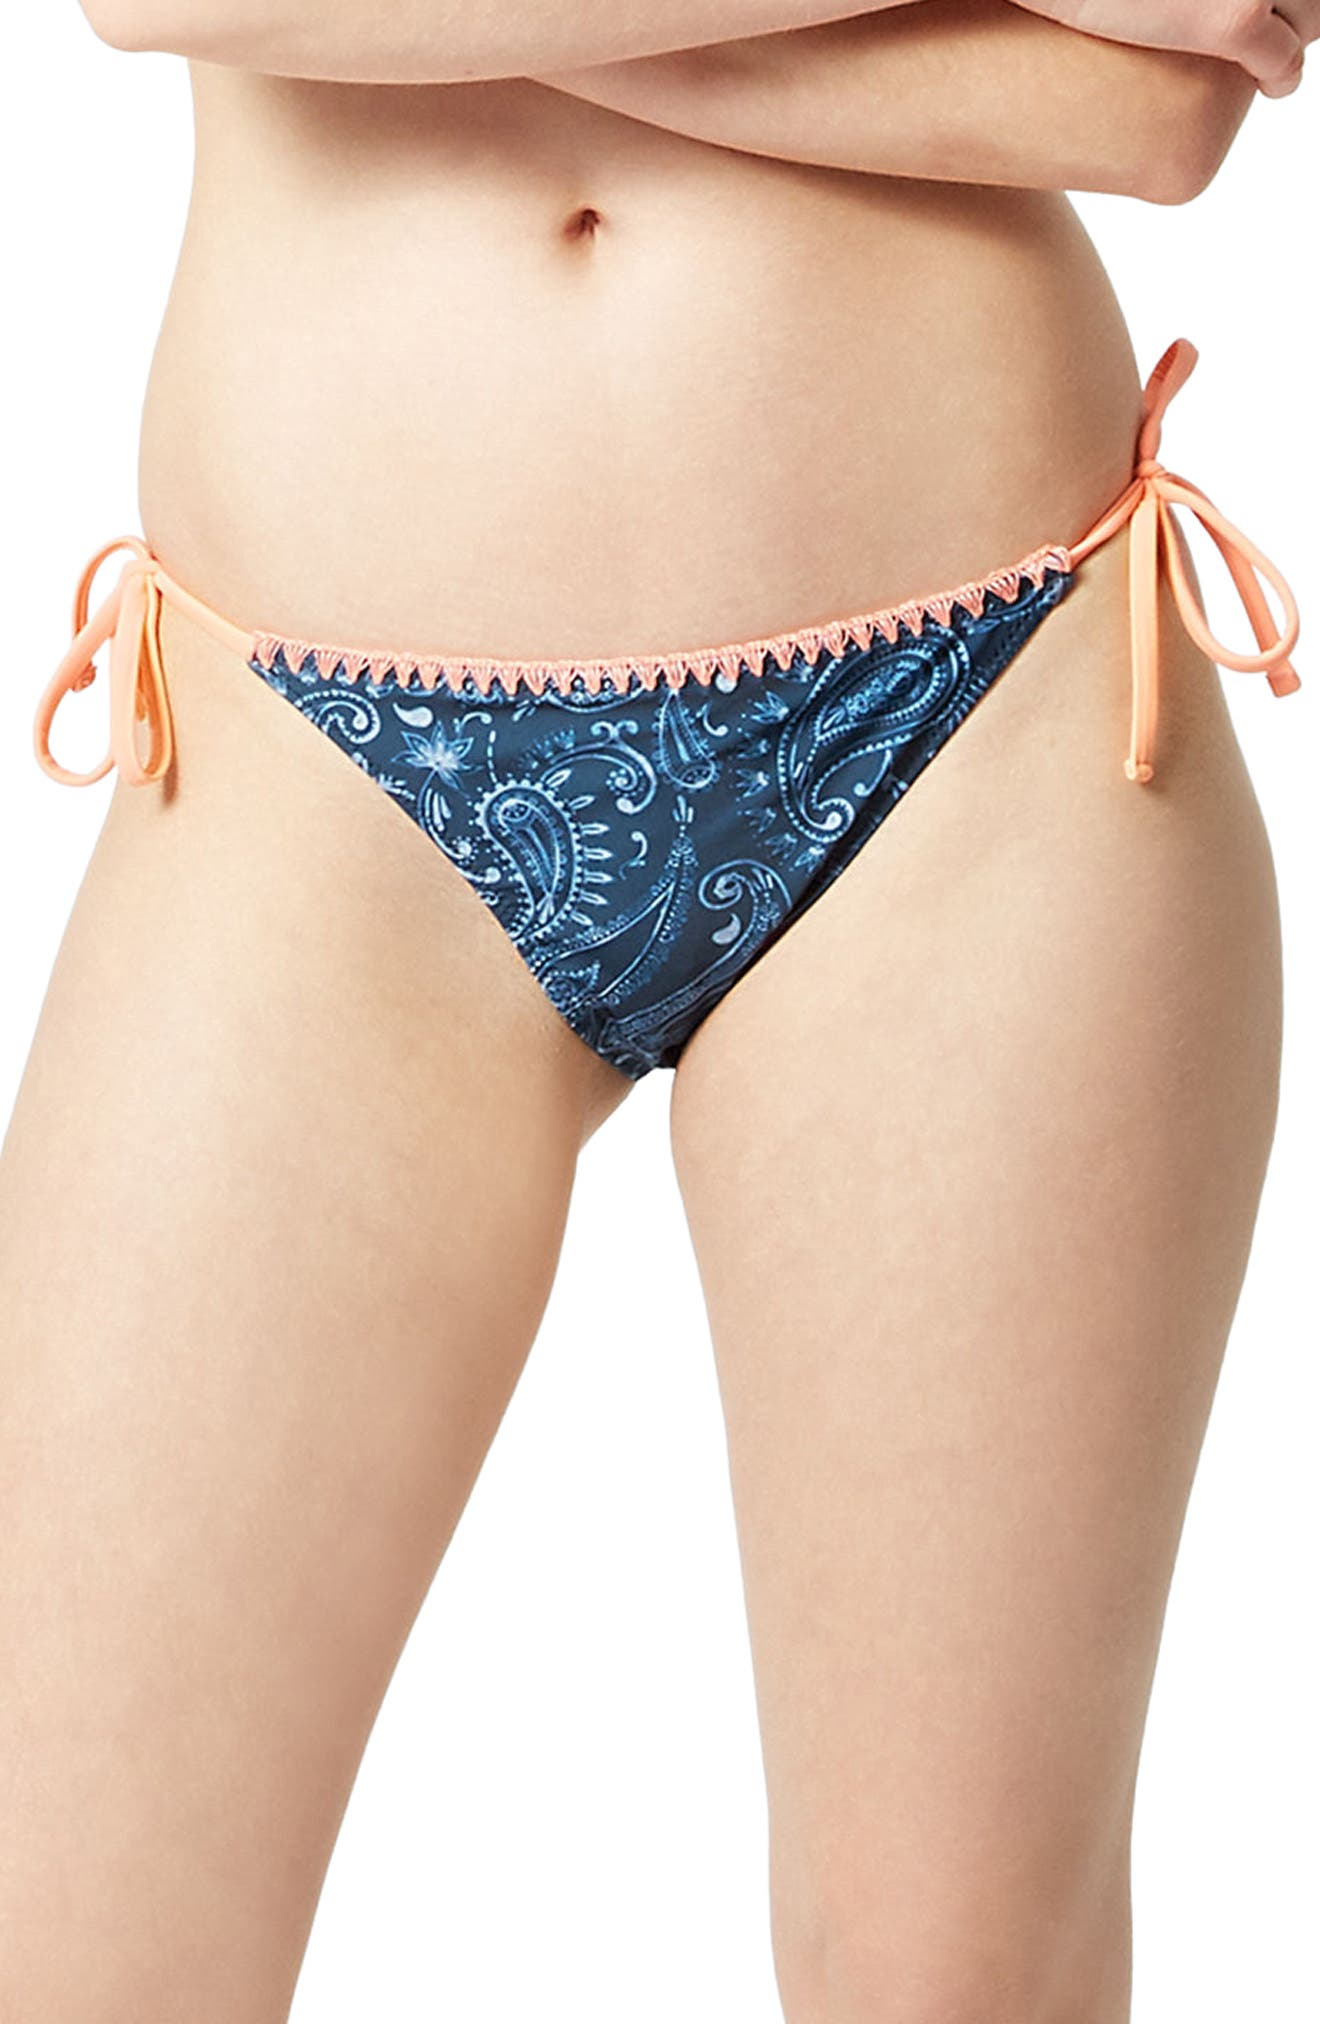 Purity Reversible Bikini Bottoms,                         Main,                         color, 400